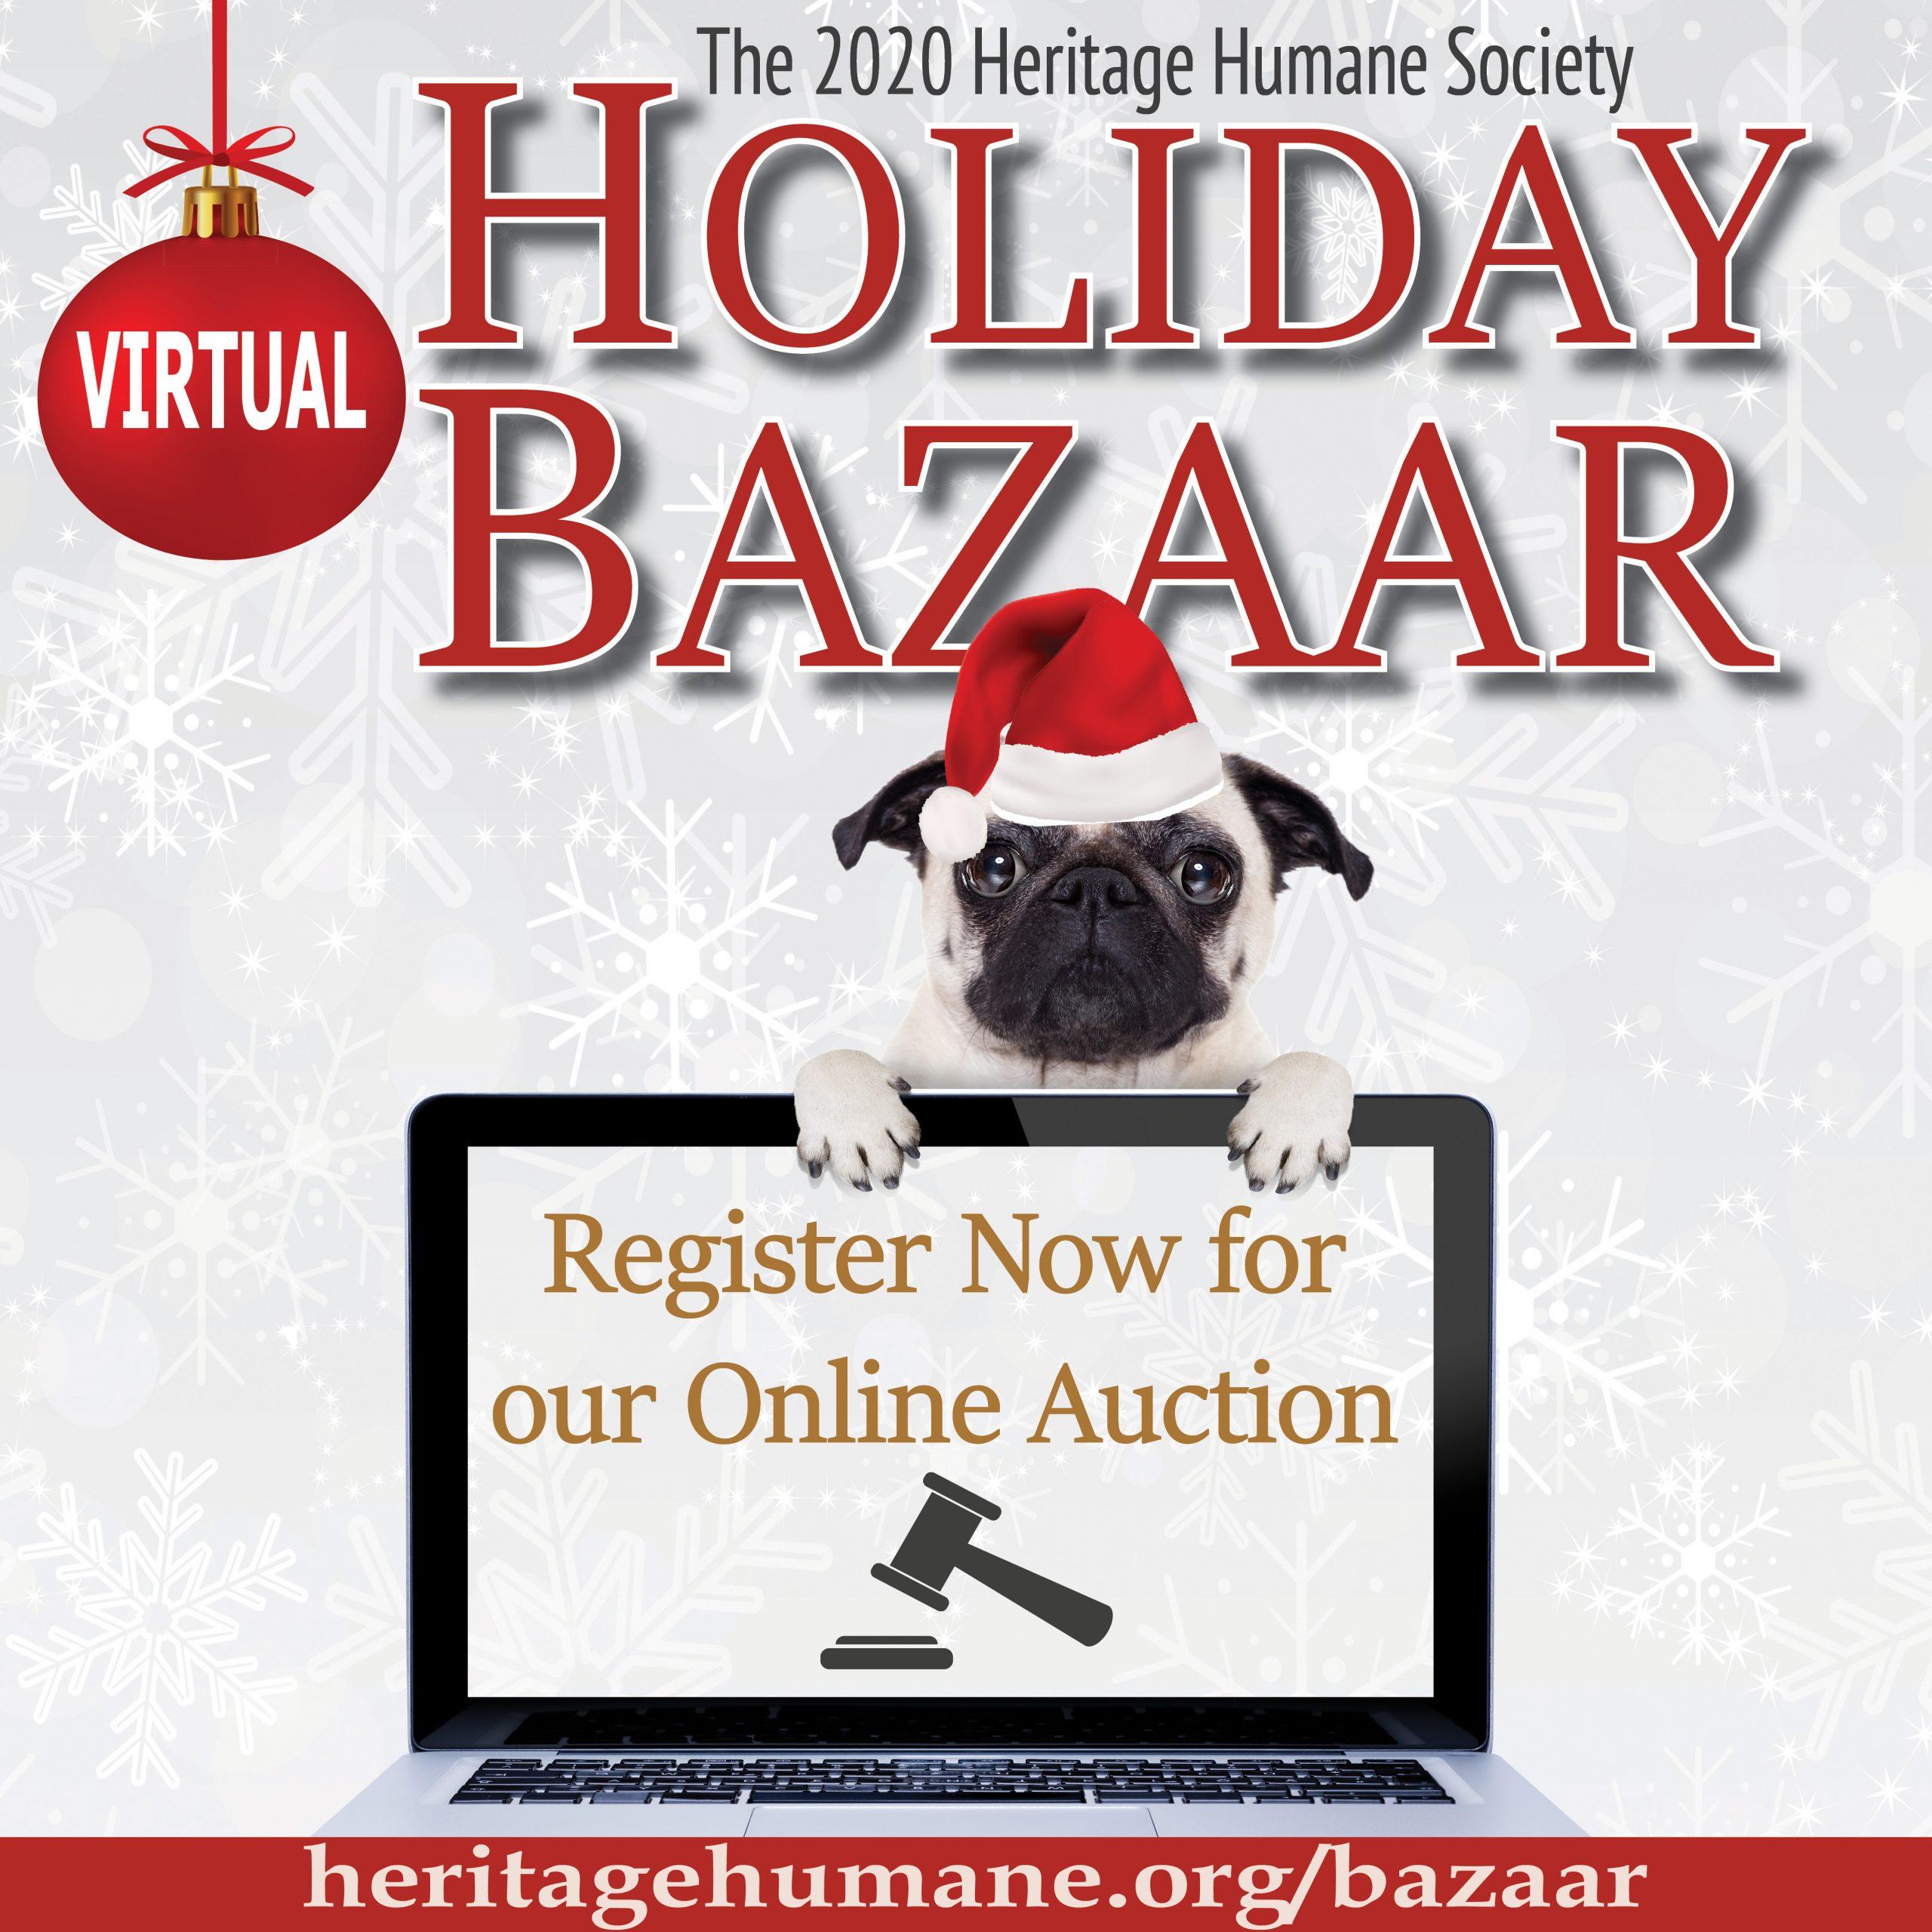 Our Online Holiday Bazaar is OPEN!   Heritage Humane